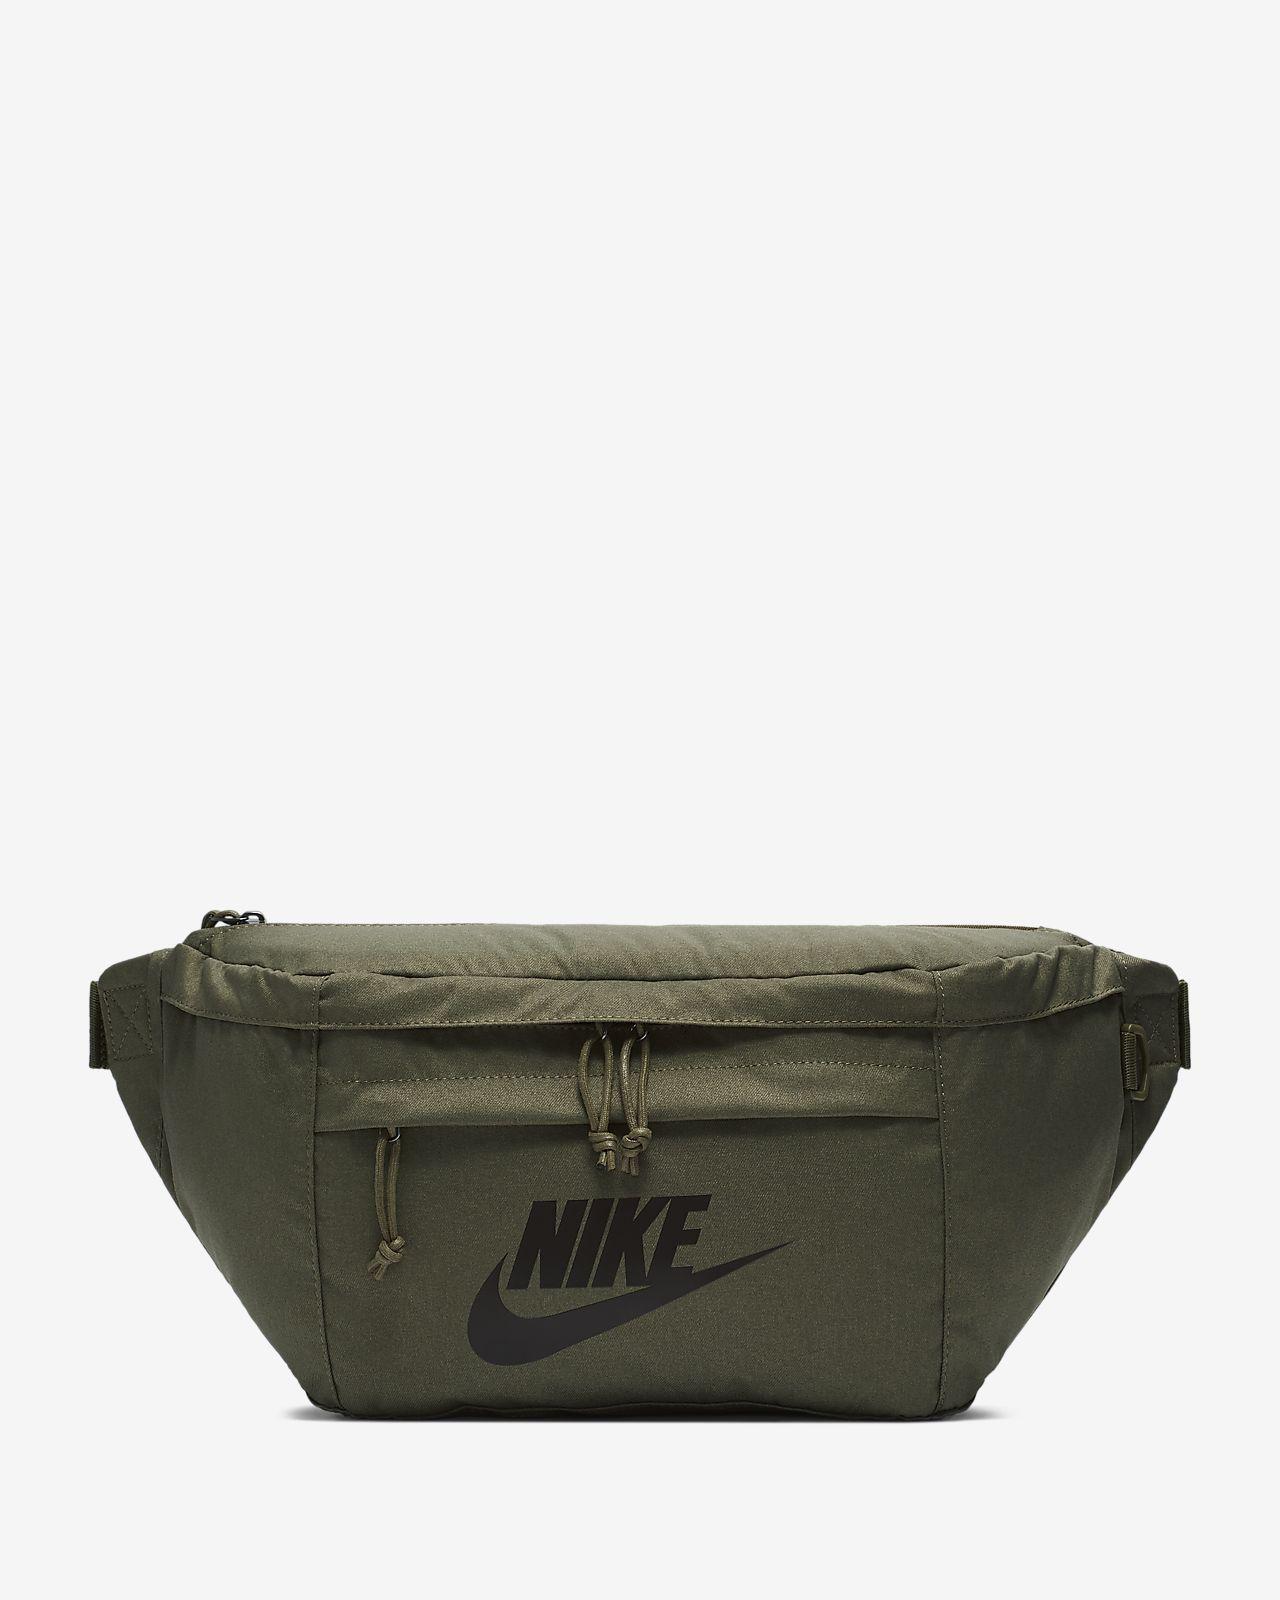 fdb2e05922f5a2 ... Jordan Airborne Crossbody Bag  Nike Tech Hip Pack  Popular items for kids  fanny ...